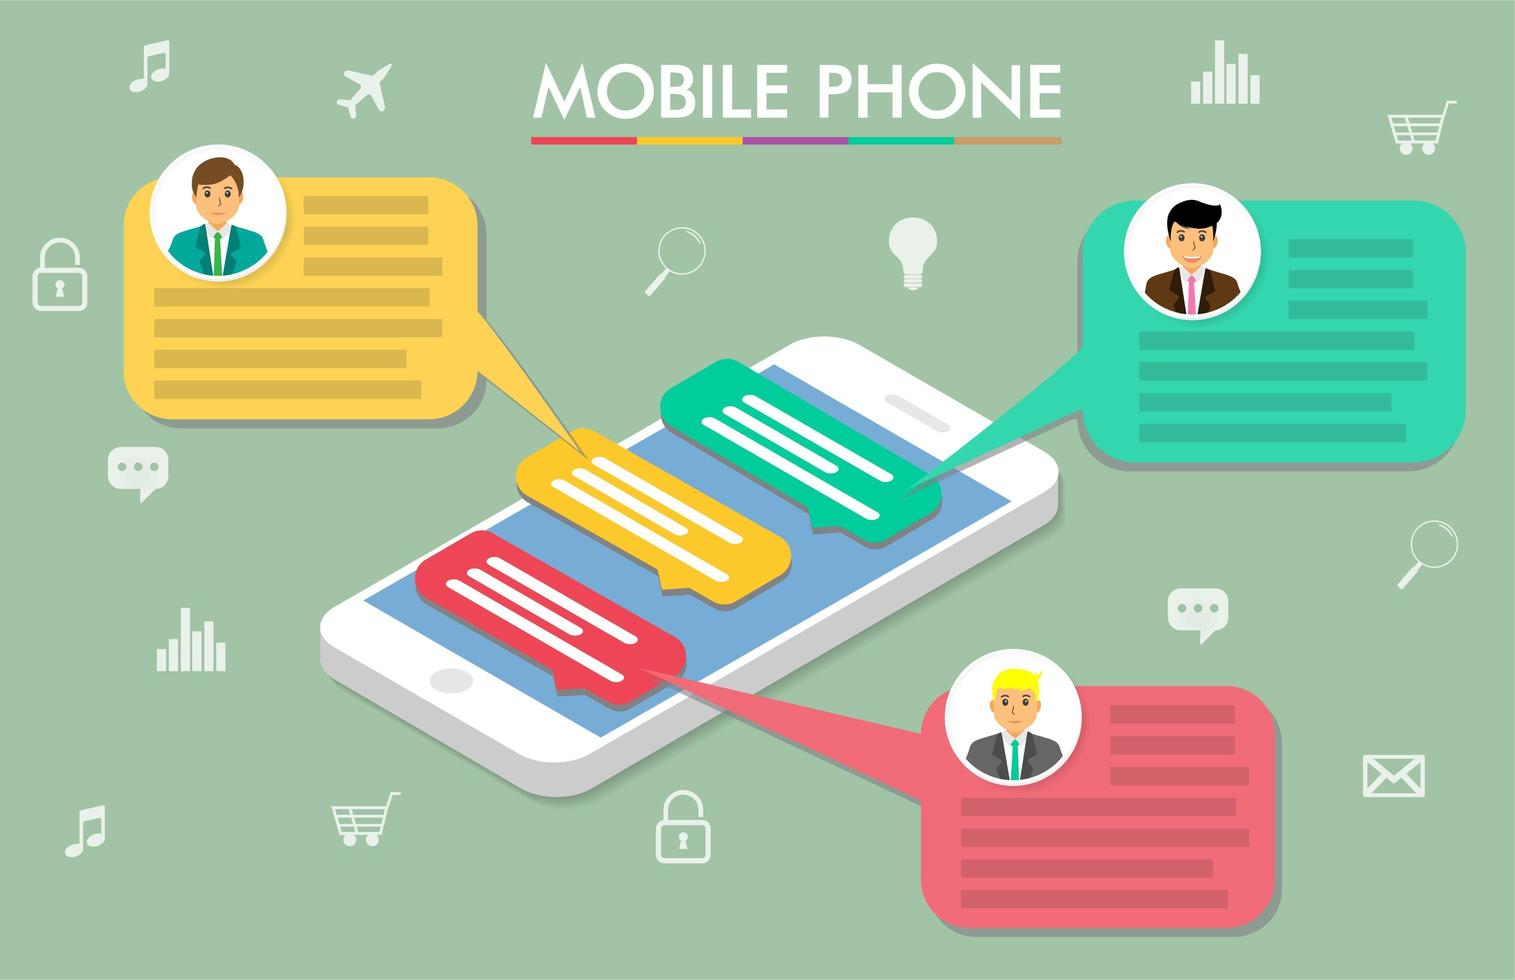 smartphone nytt meddelande chat app design vektor